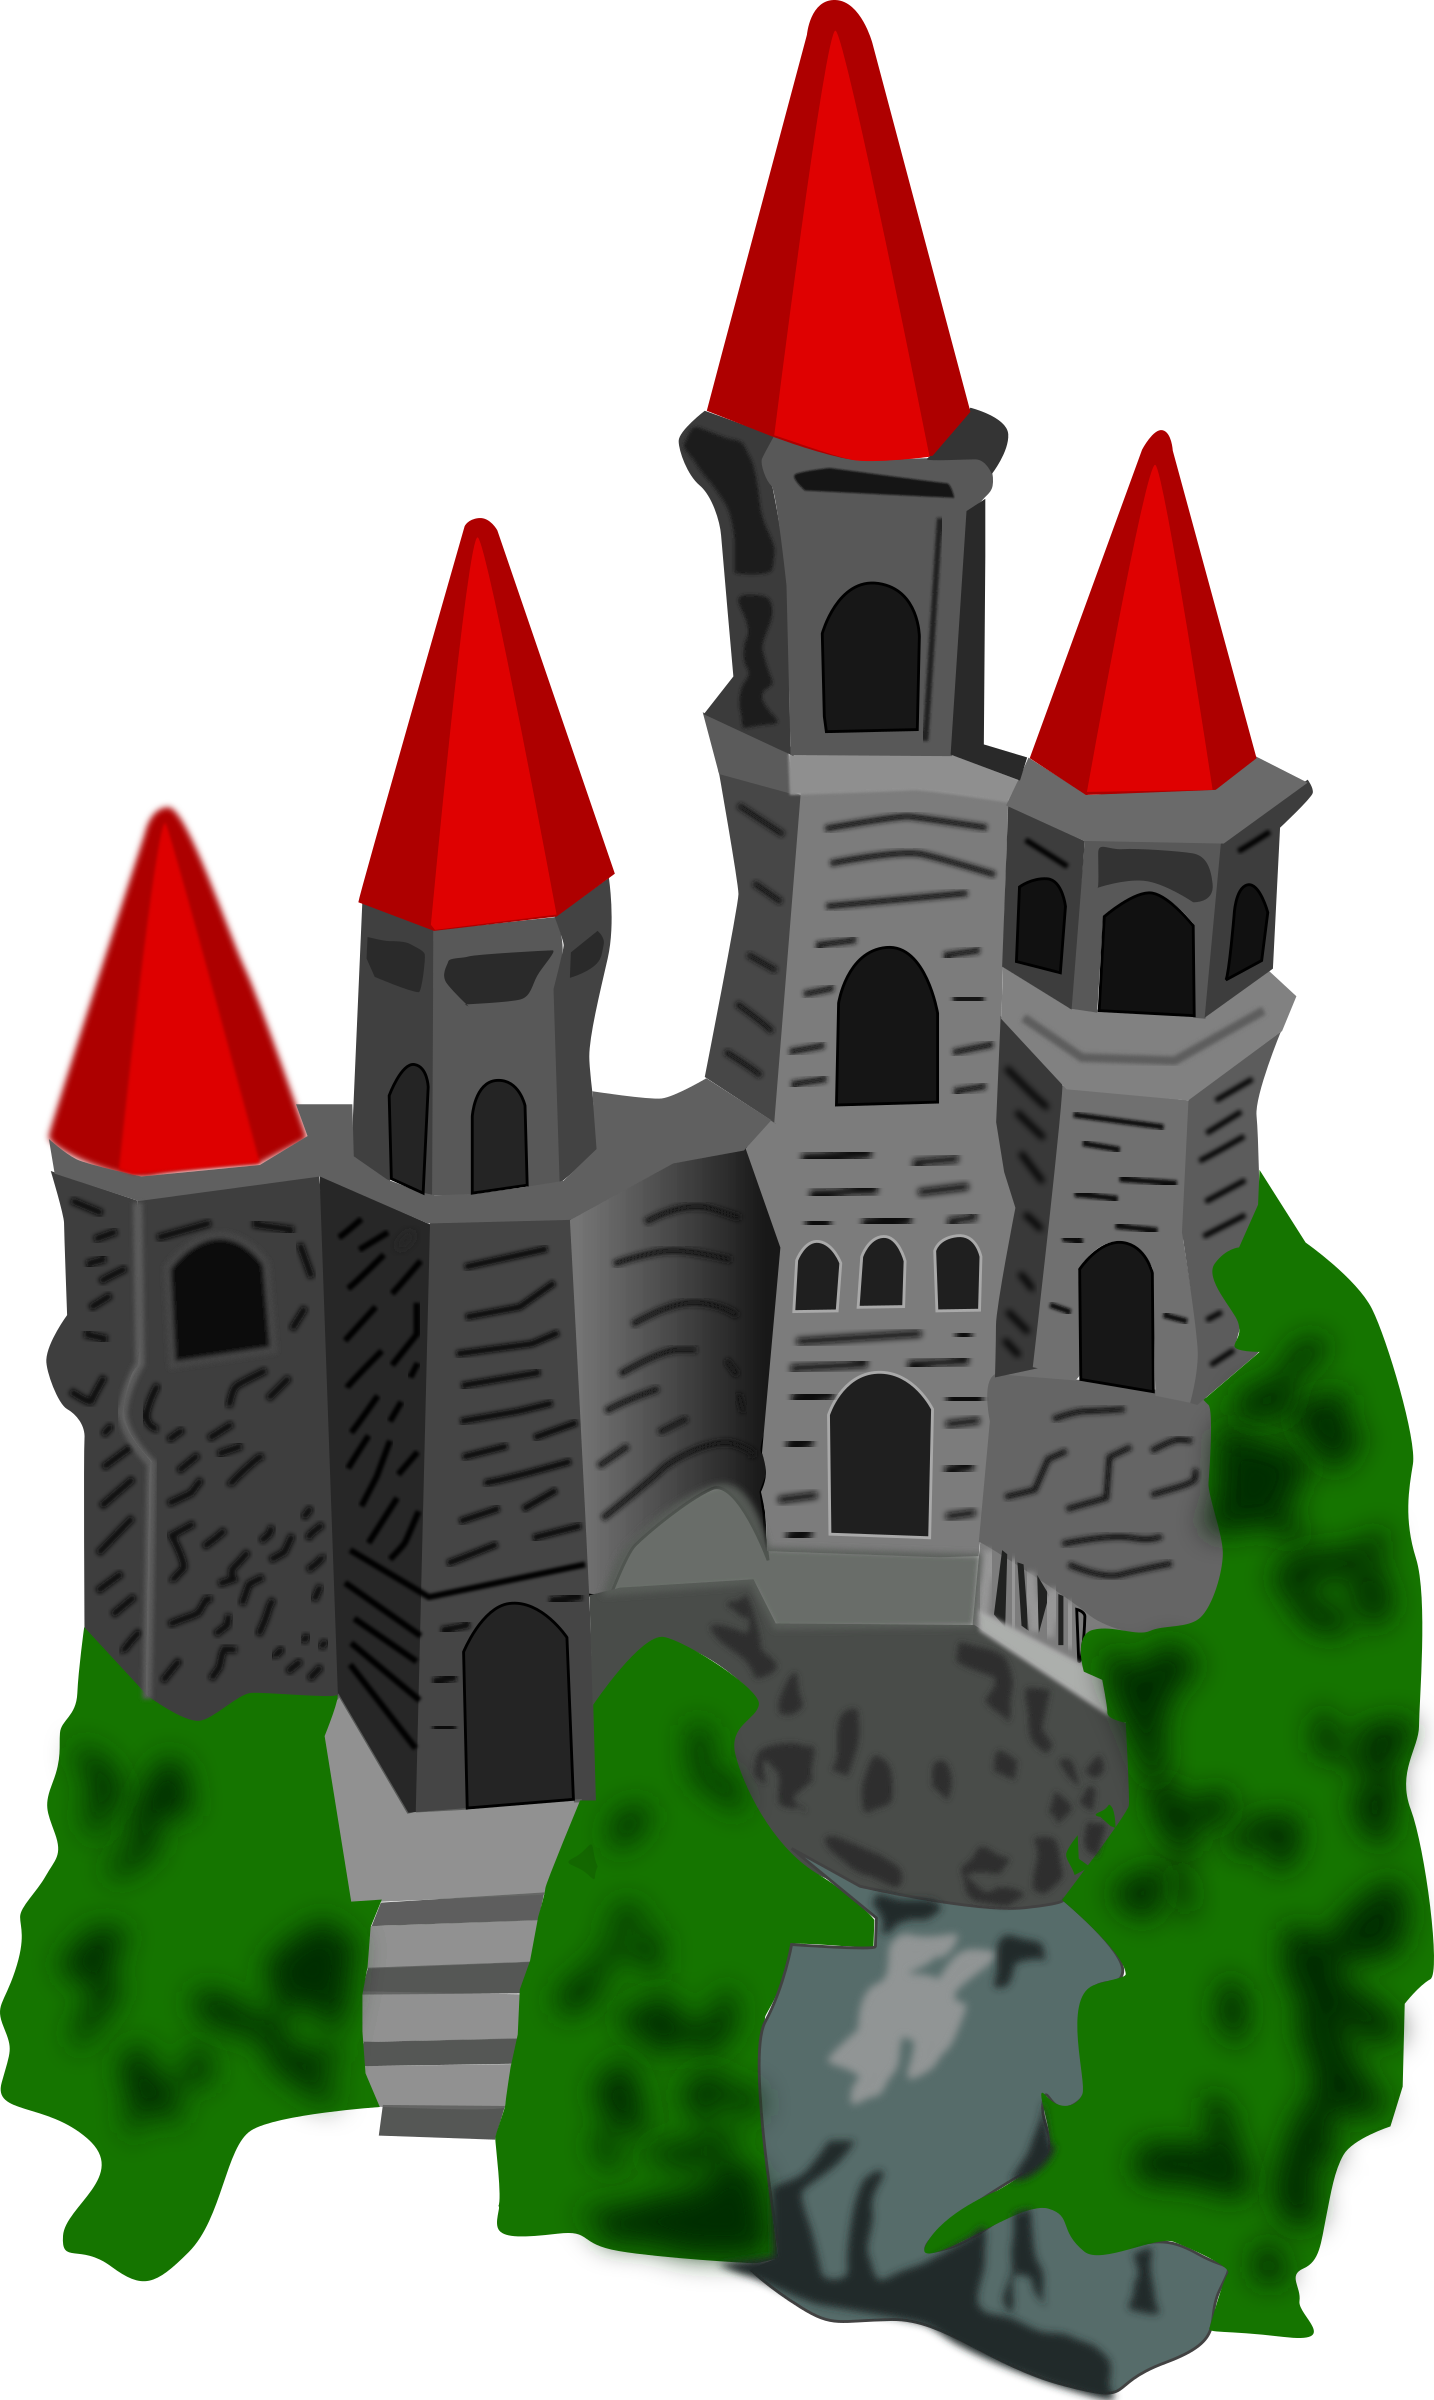 Color big image png. Clipart castle fantasy